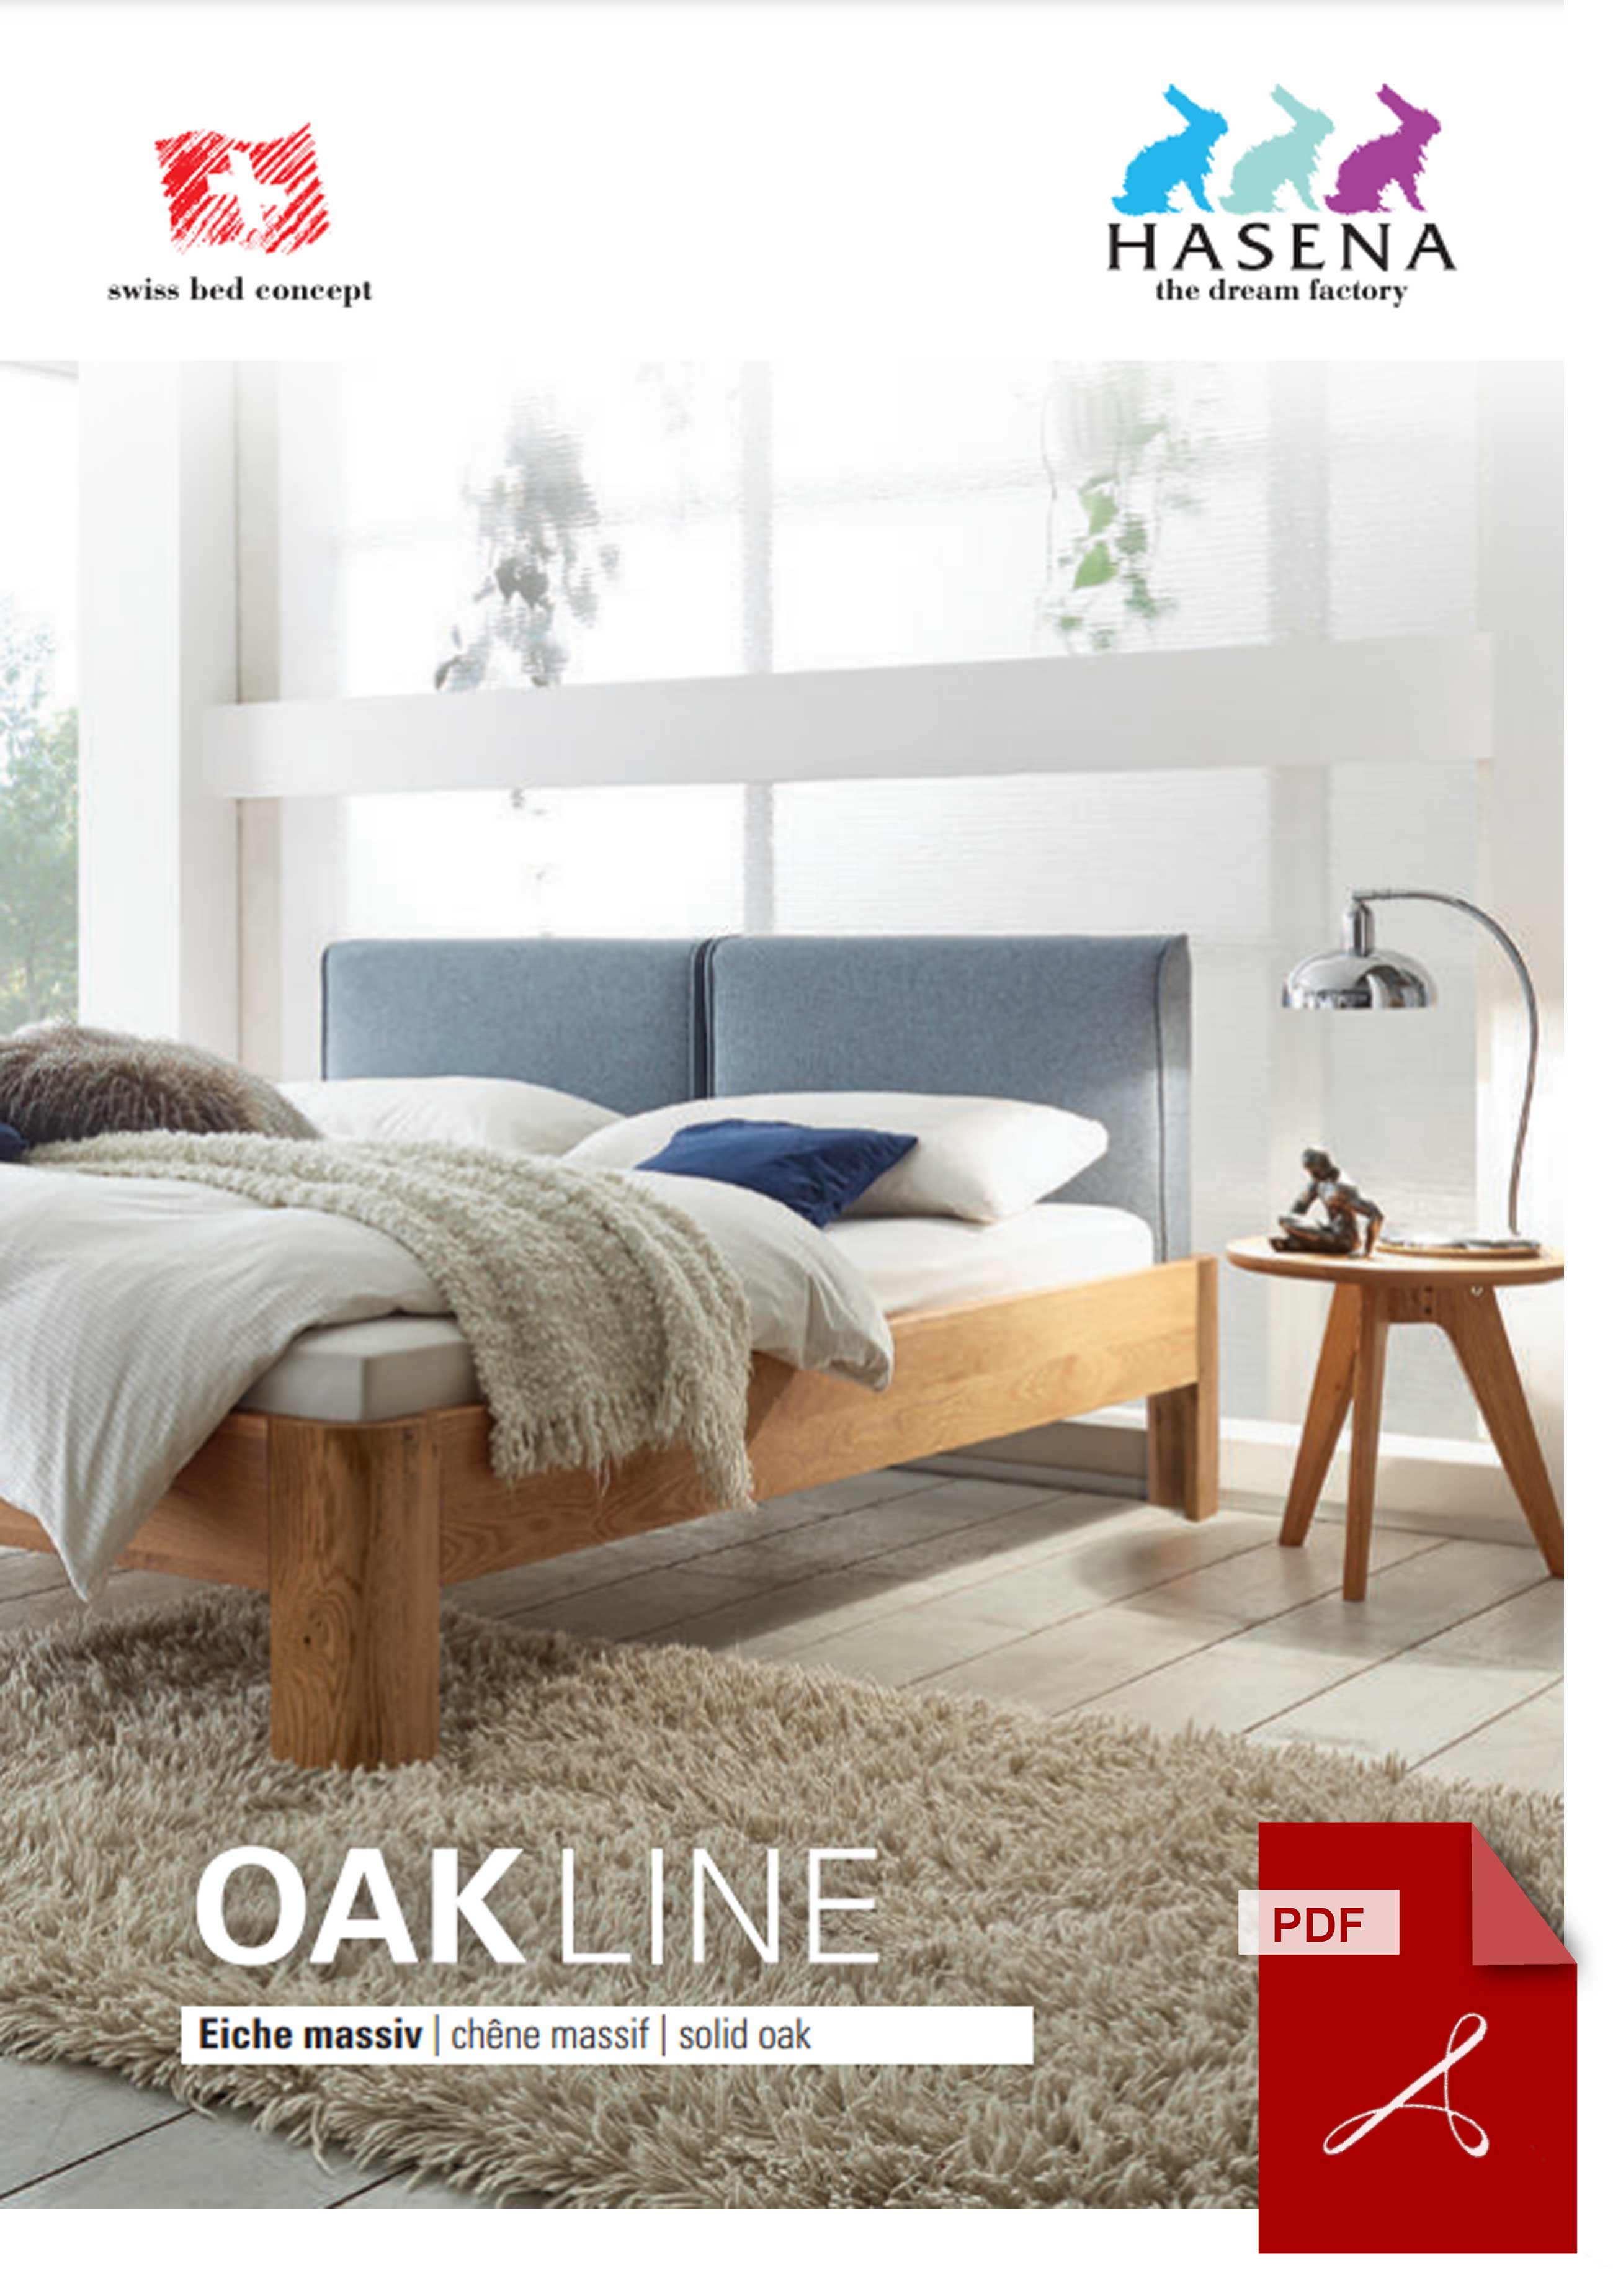 Hasena Oak Line Katalog als PDF Datei